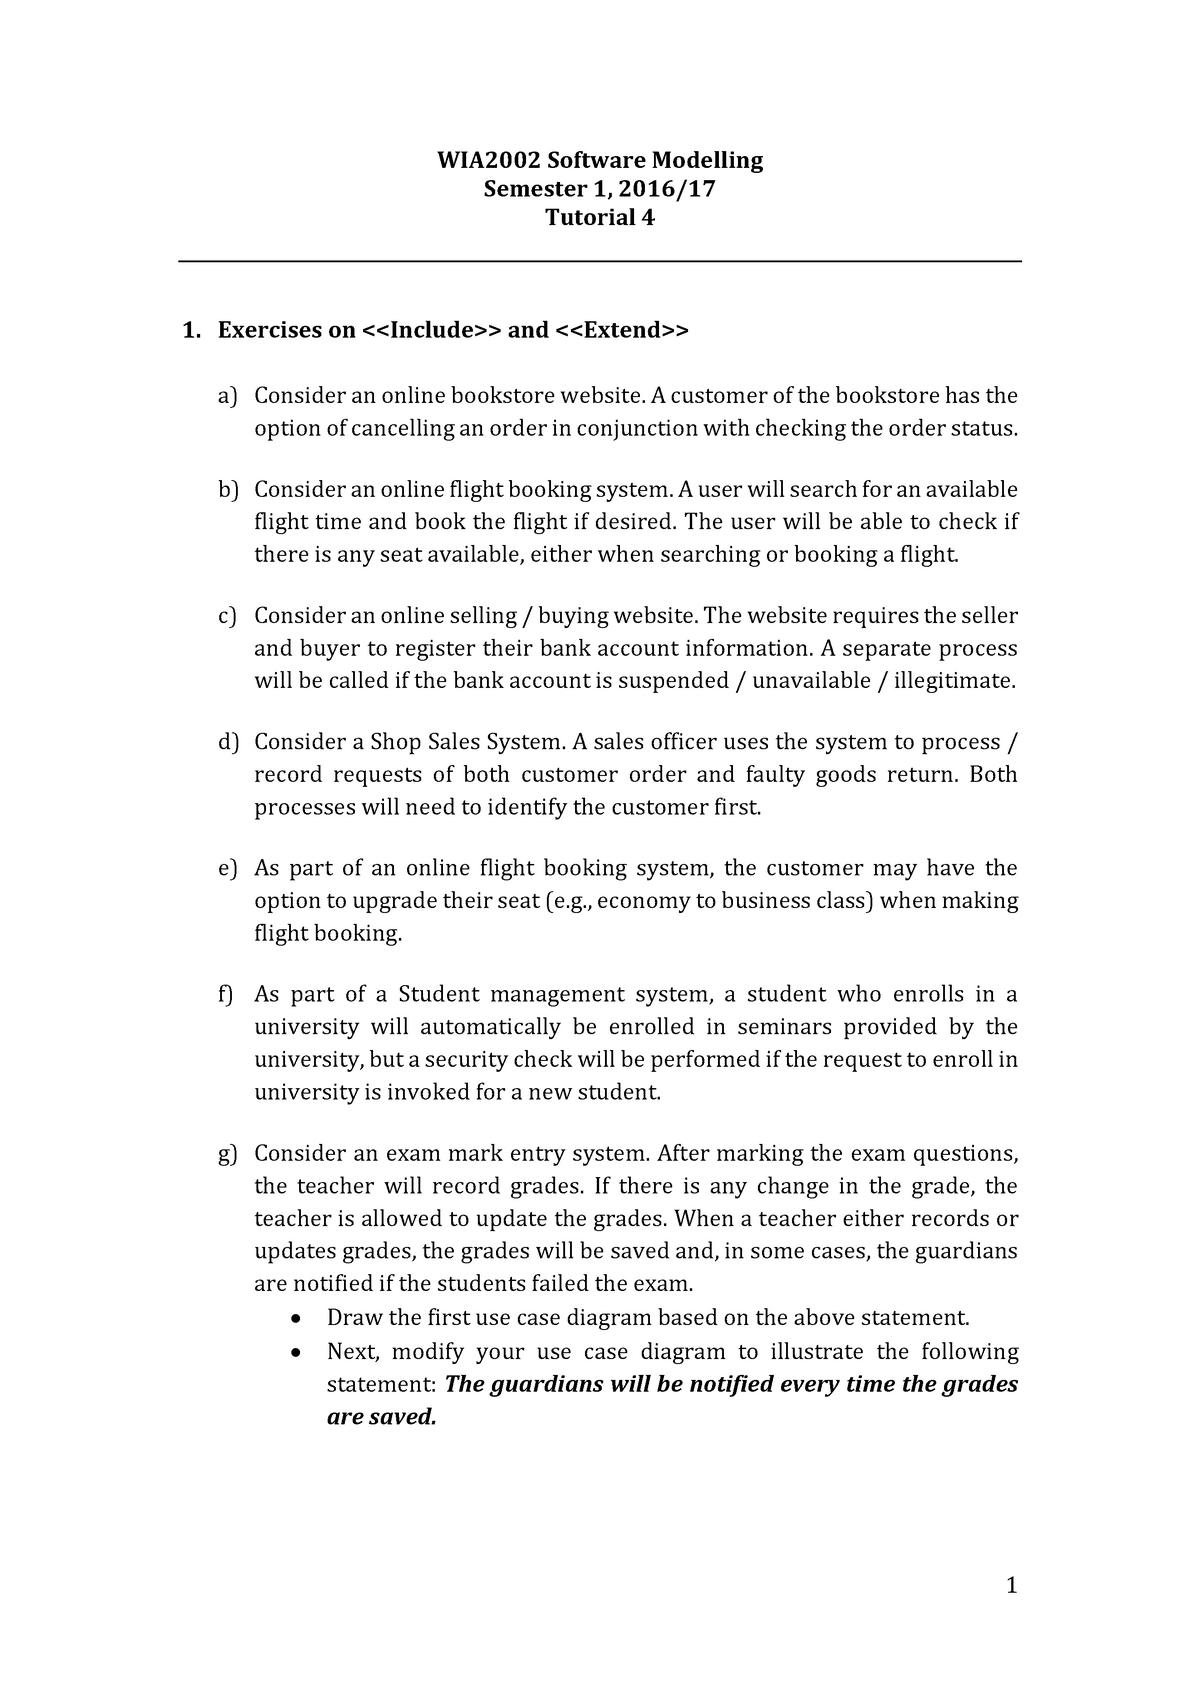 T-2002-04- Tutorial 4 - Use Case Diagram - WIA2002: Software